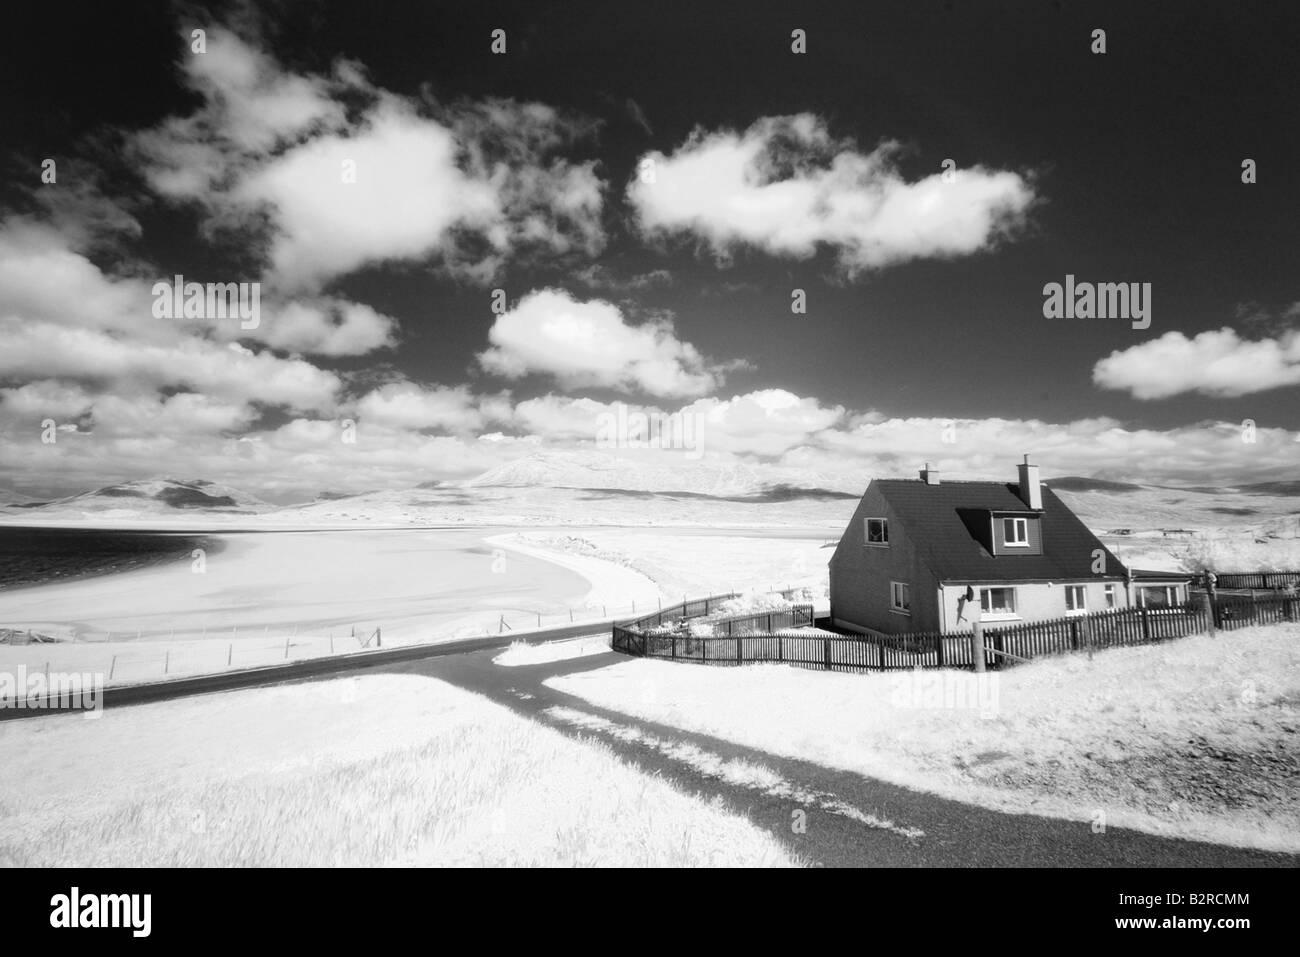 Infrared image of a house next to Seilebost beach, Isle of Harris, Hebrides, Scotland, UK - Stock Image